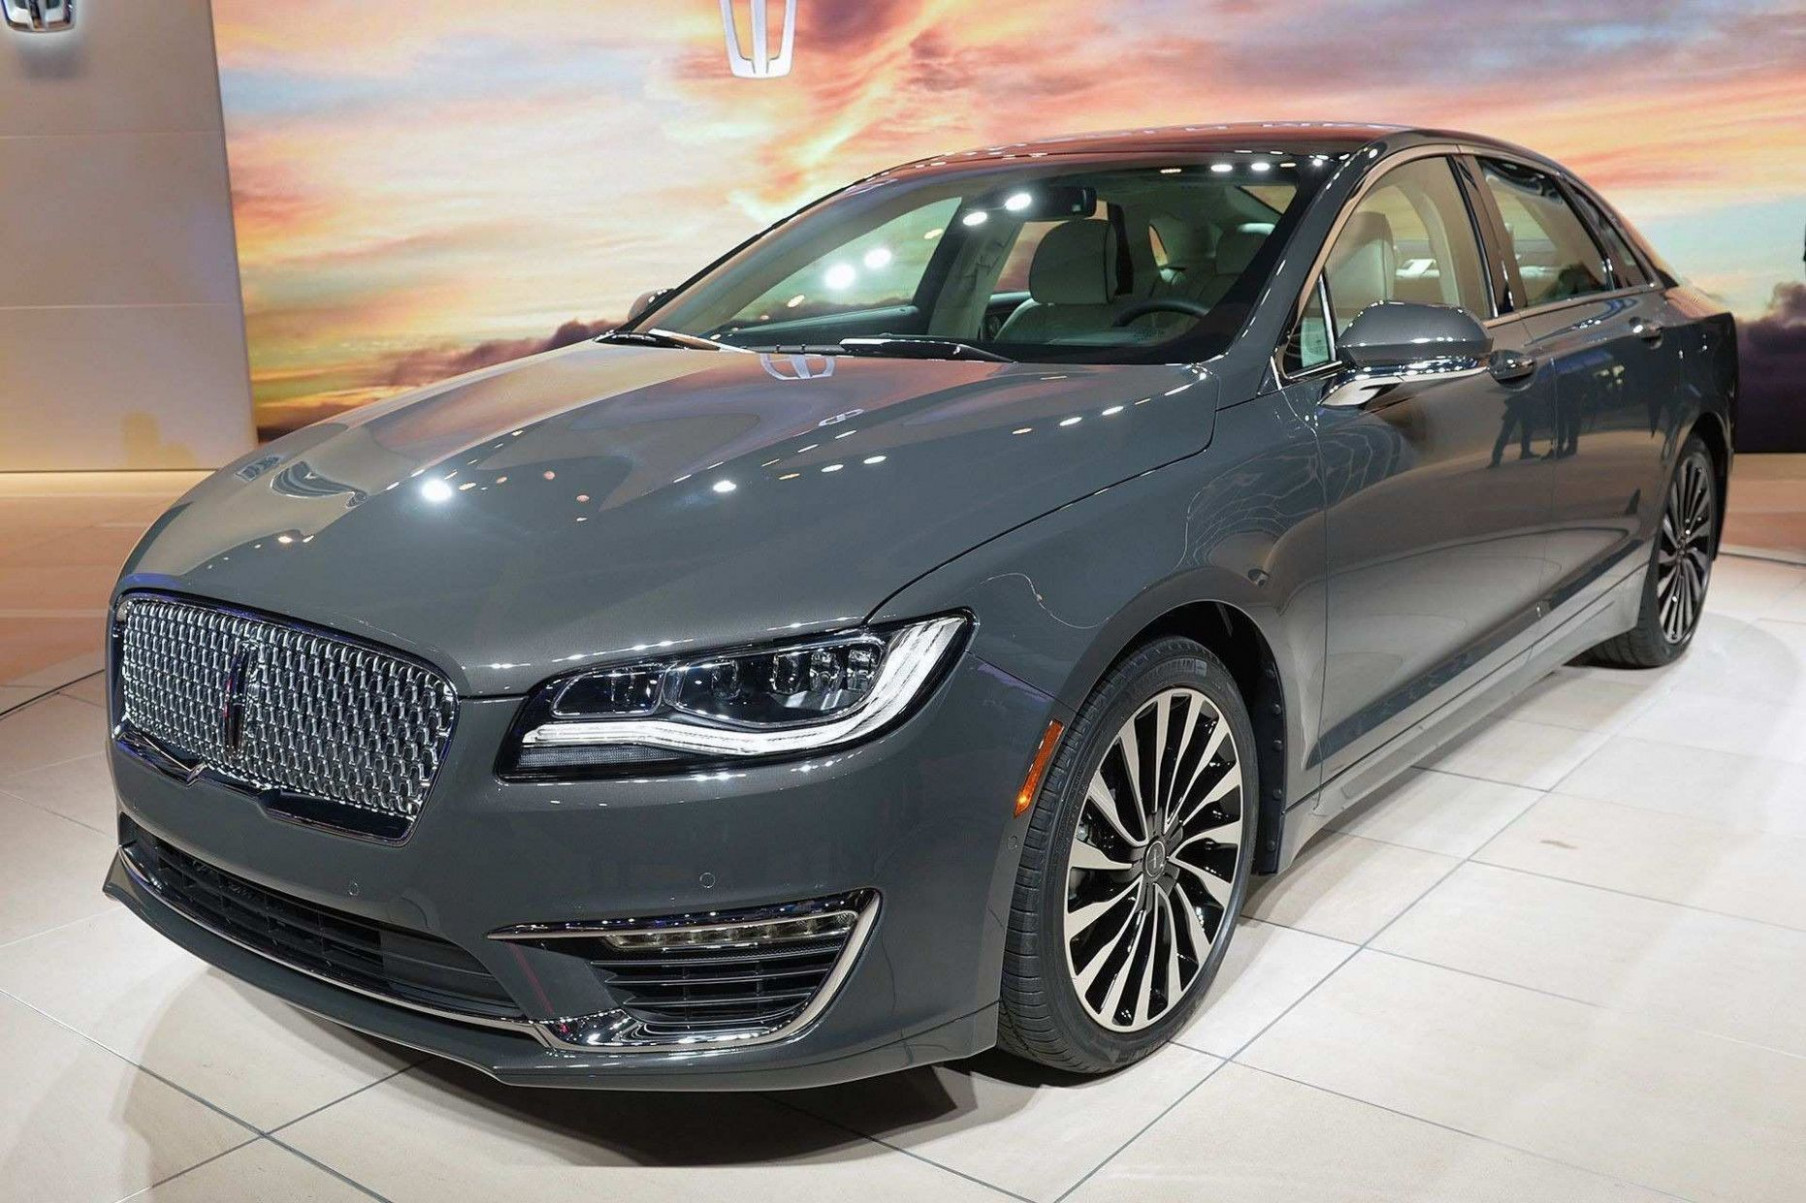 Spesification Spy Shots Lincoln Mkz Sedan